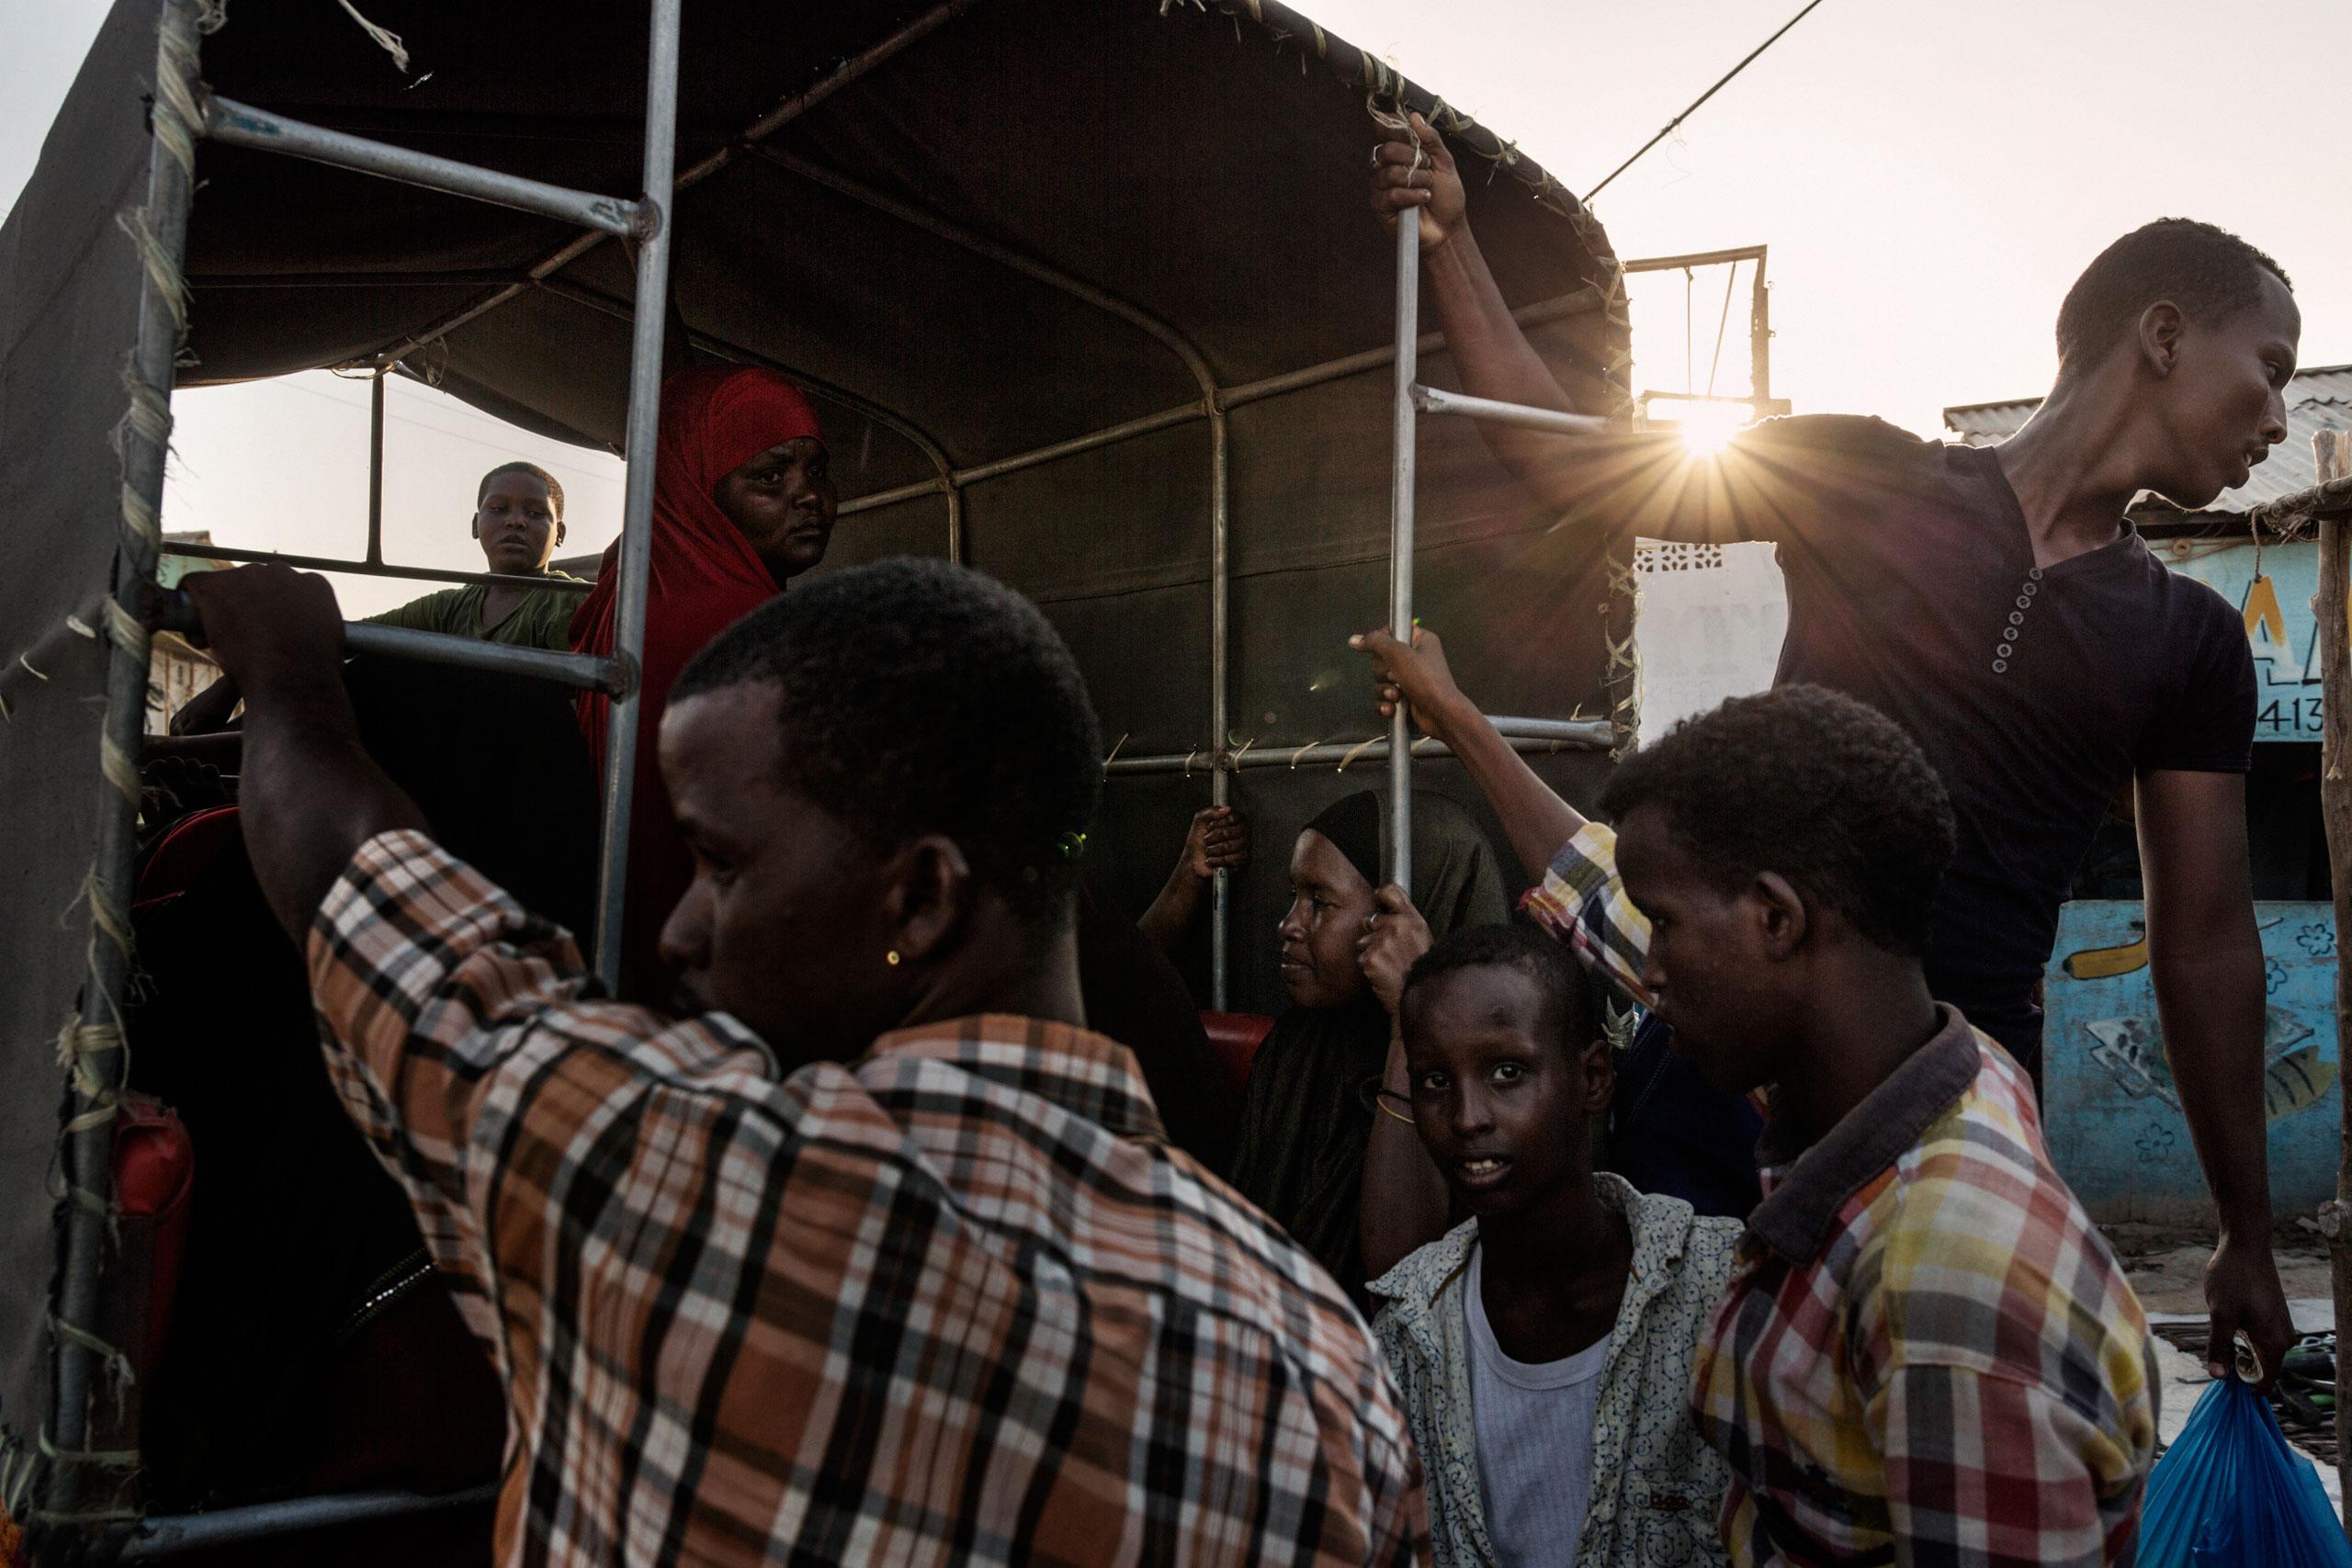 Locals commute daily using rickshaws, a common mean of transportation among Somalis. Bosaso, Somalia. October 5, 2015